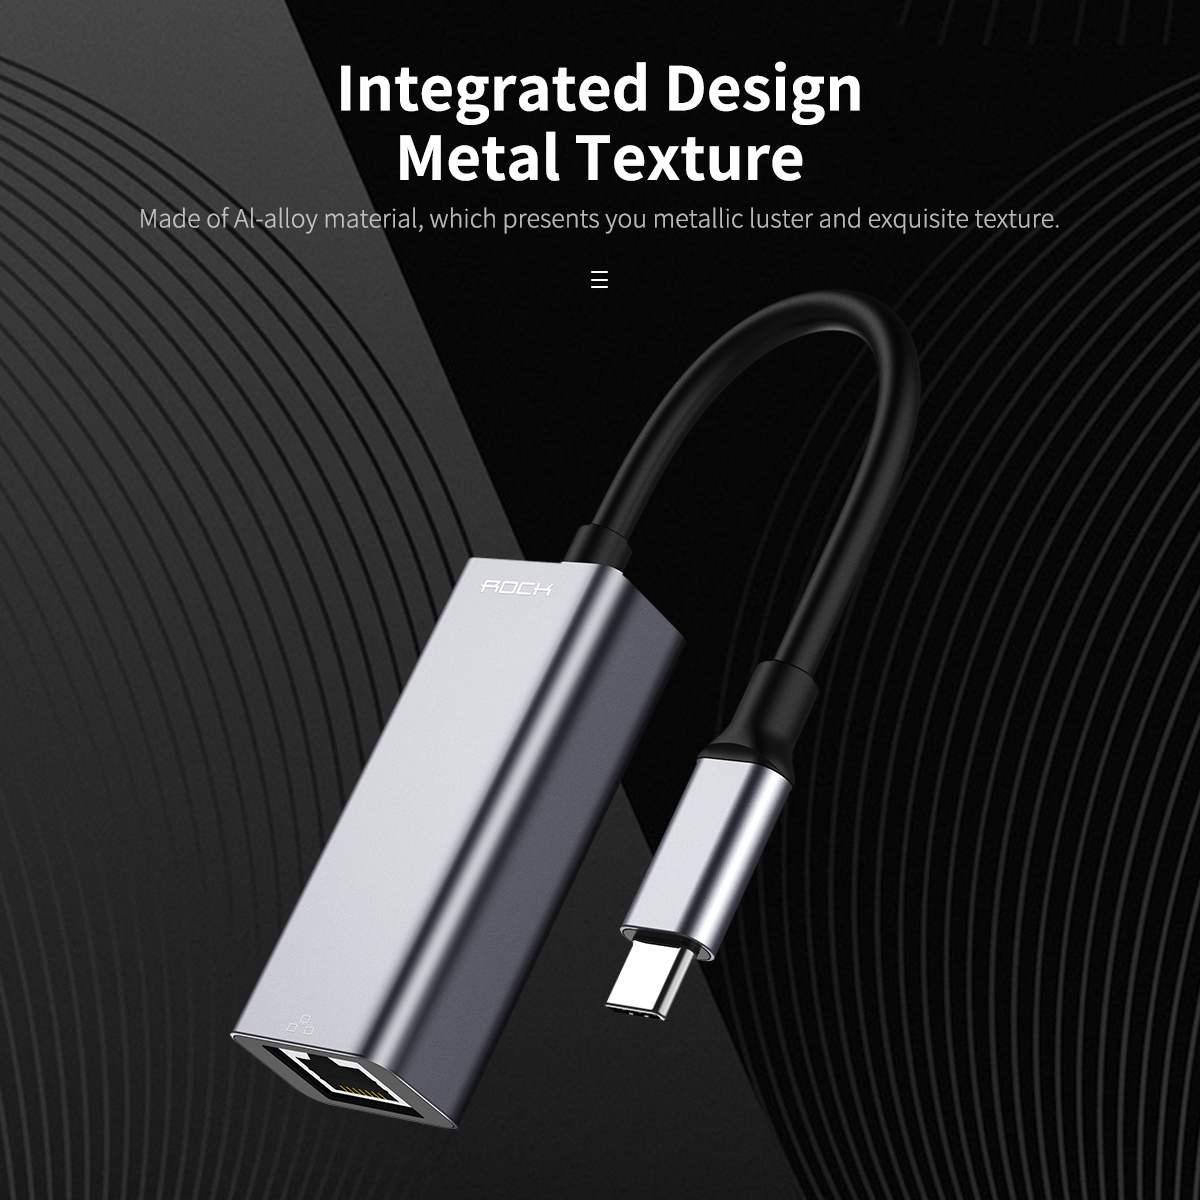 Rock Ethernet-Network-Adapter Dock Hub-Converter USB-C RJ45 To Matal-Texture Integrated-Design